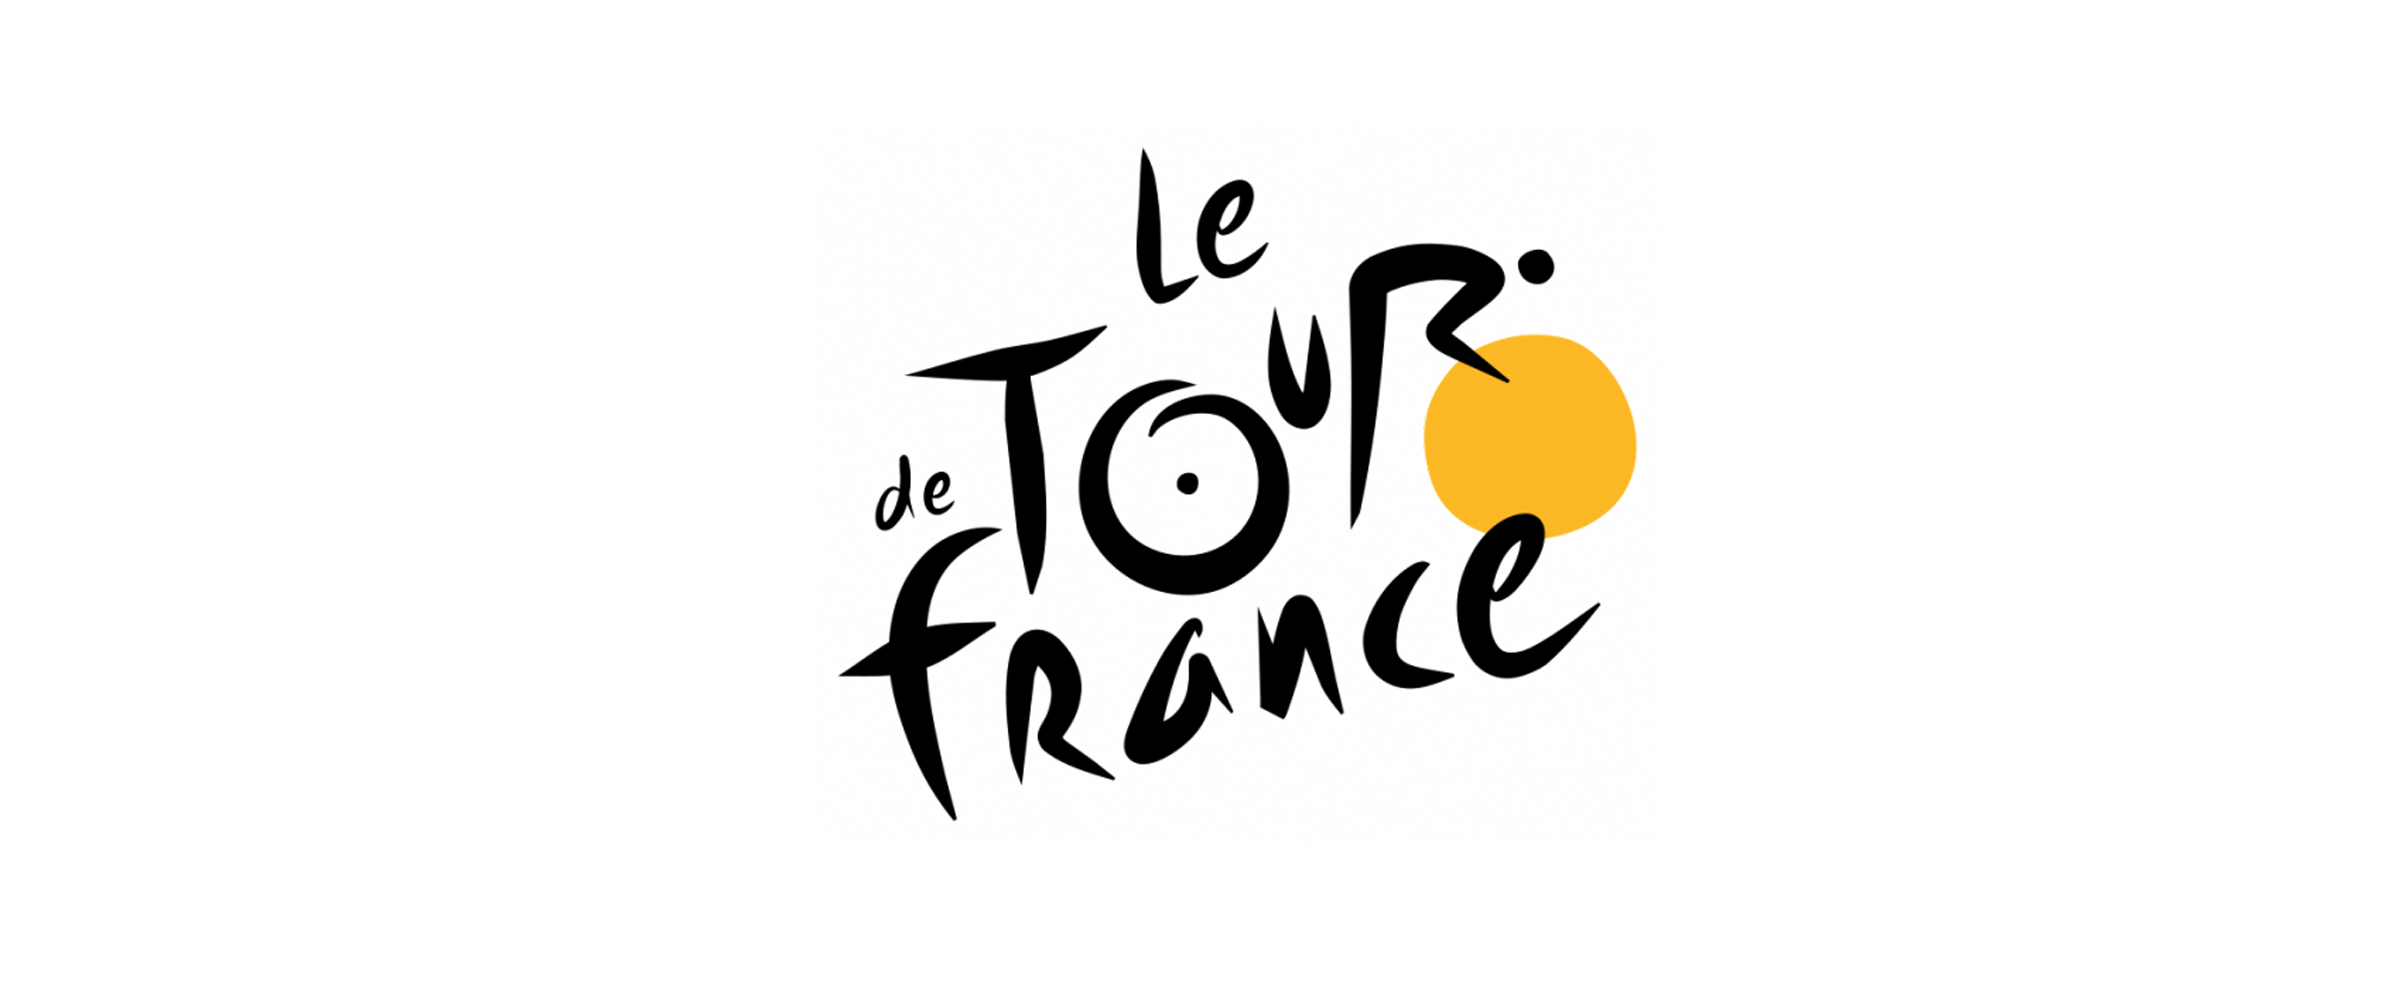 Tour de France Livestream Etappe 14 - Rodez – Mende - NWTV: www.nwtv.nl/104932/tour-de-france-livestream-etappe-14-rodez-mende